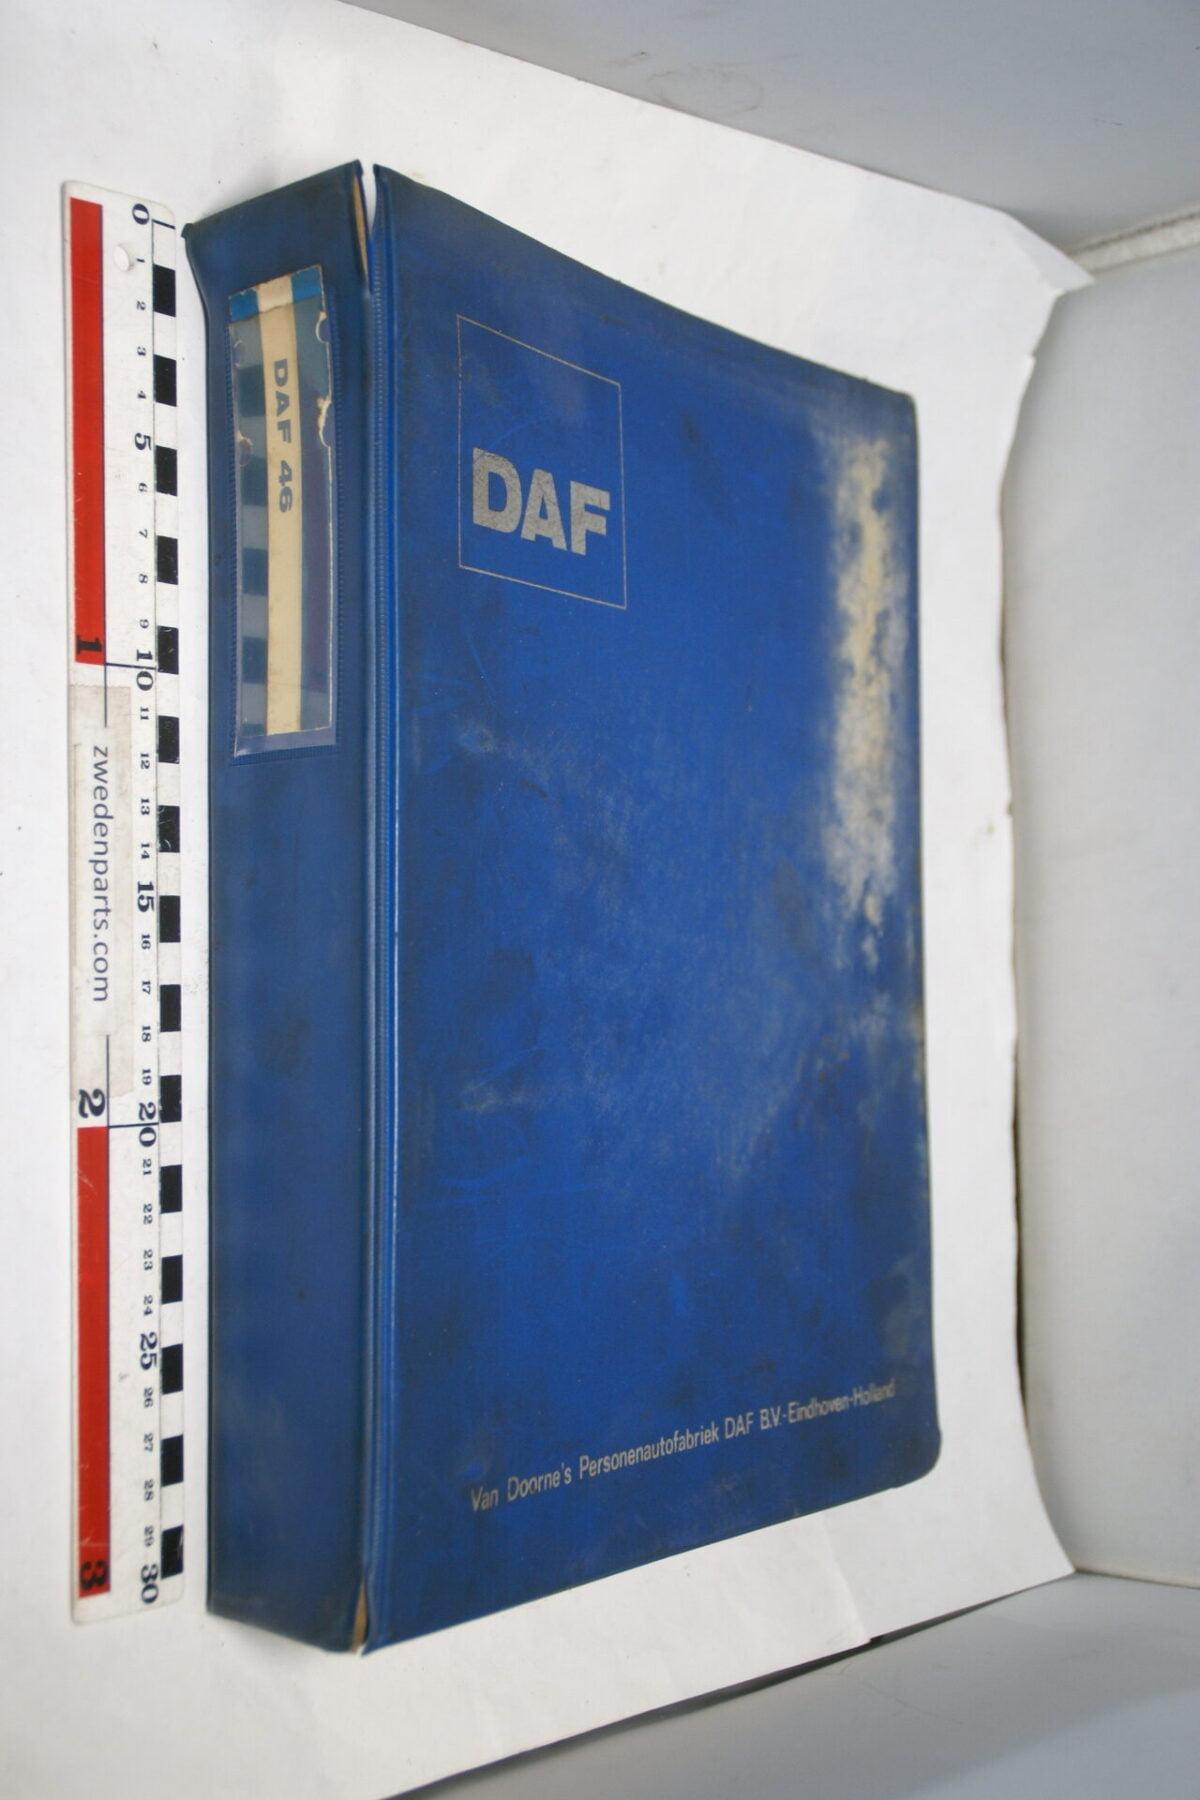 DSC01283 origineel DAF 46 onderdelenboek-e66e1d1d